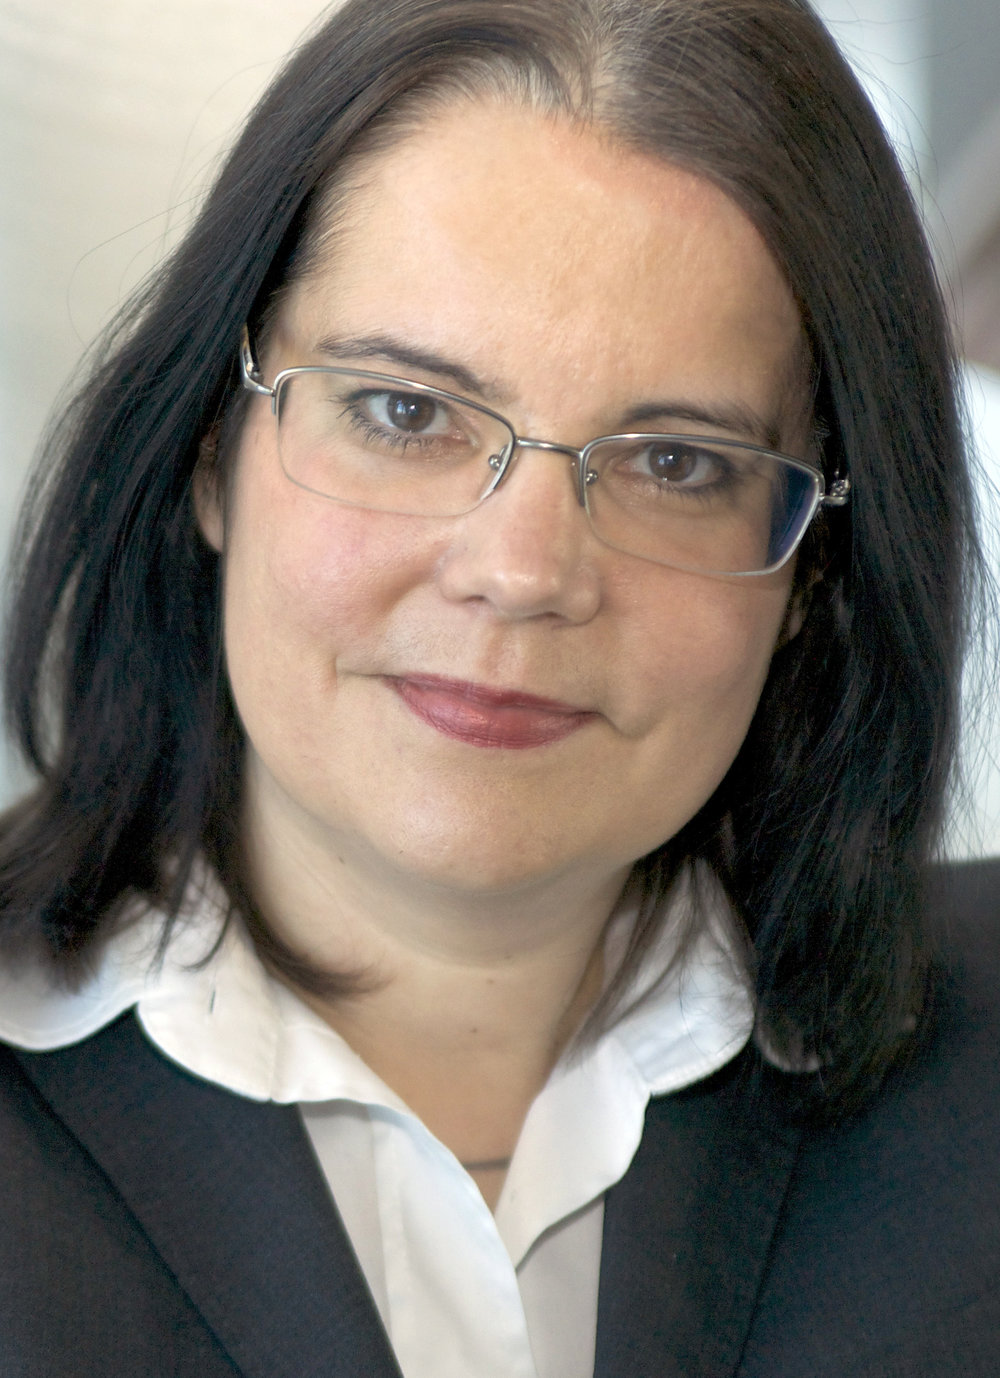 Dr.-Ing. Jutta Gehrmann.jpg